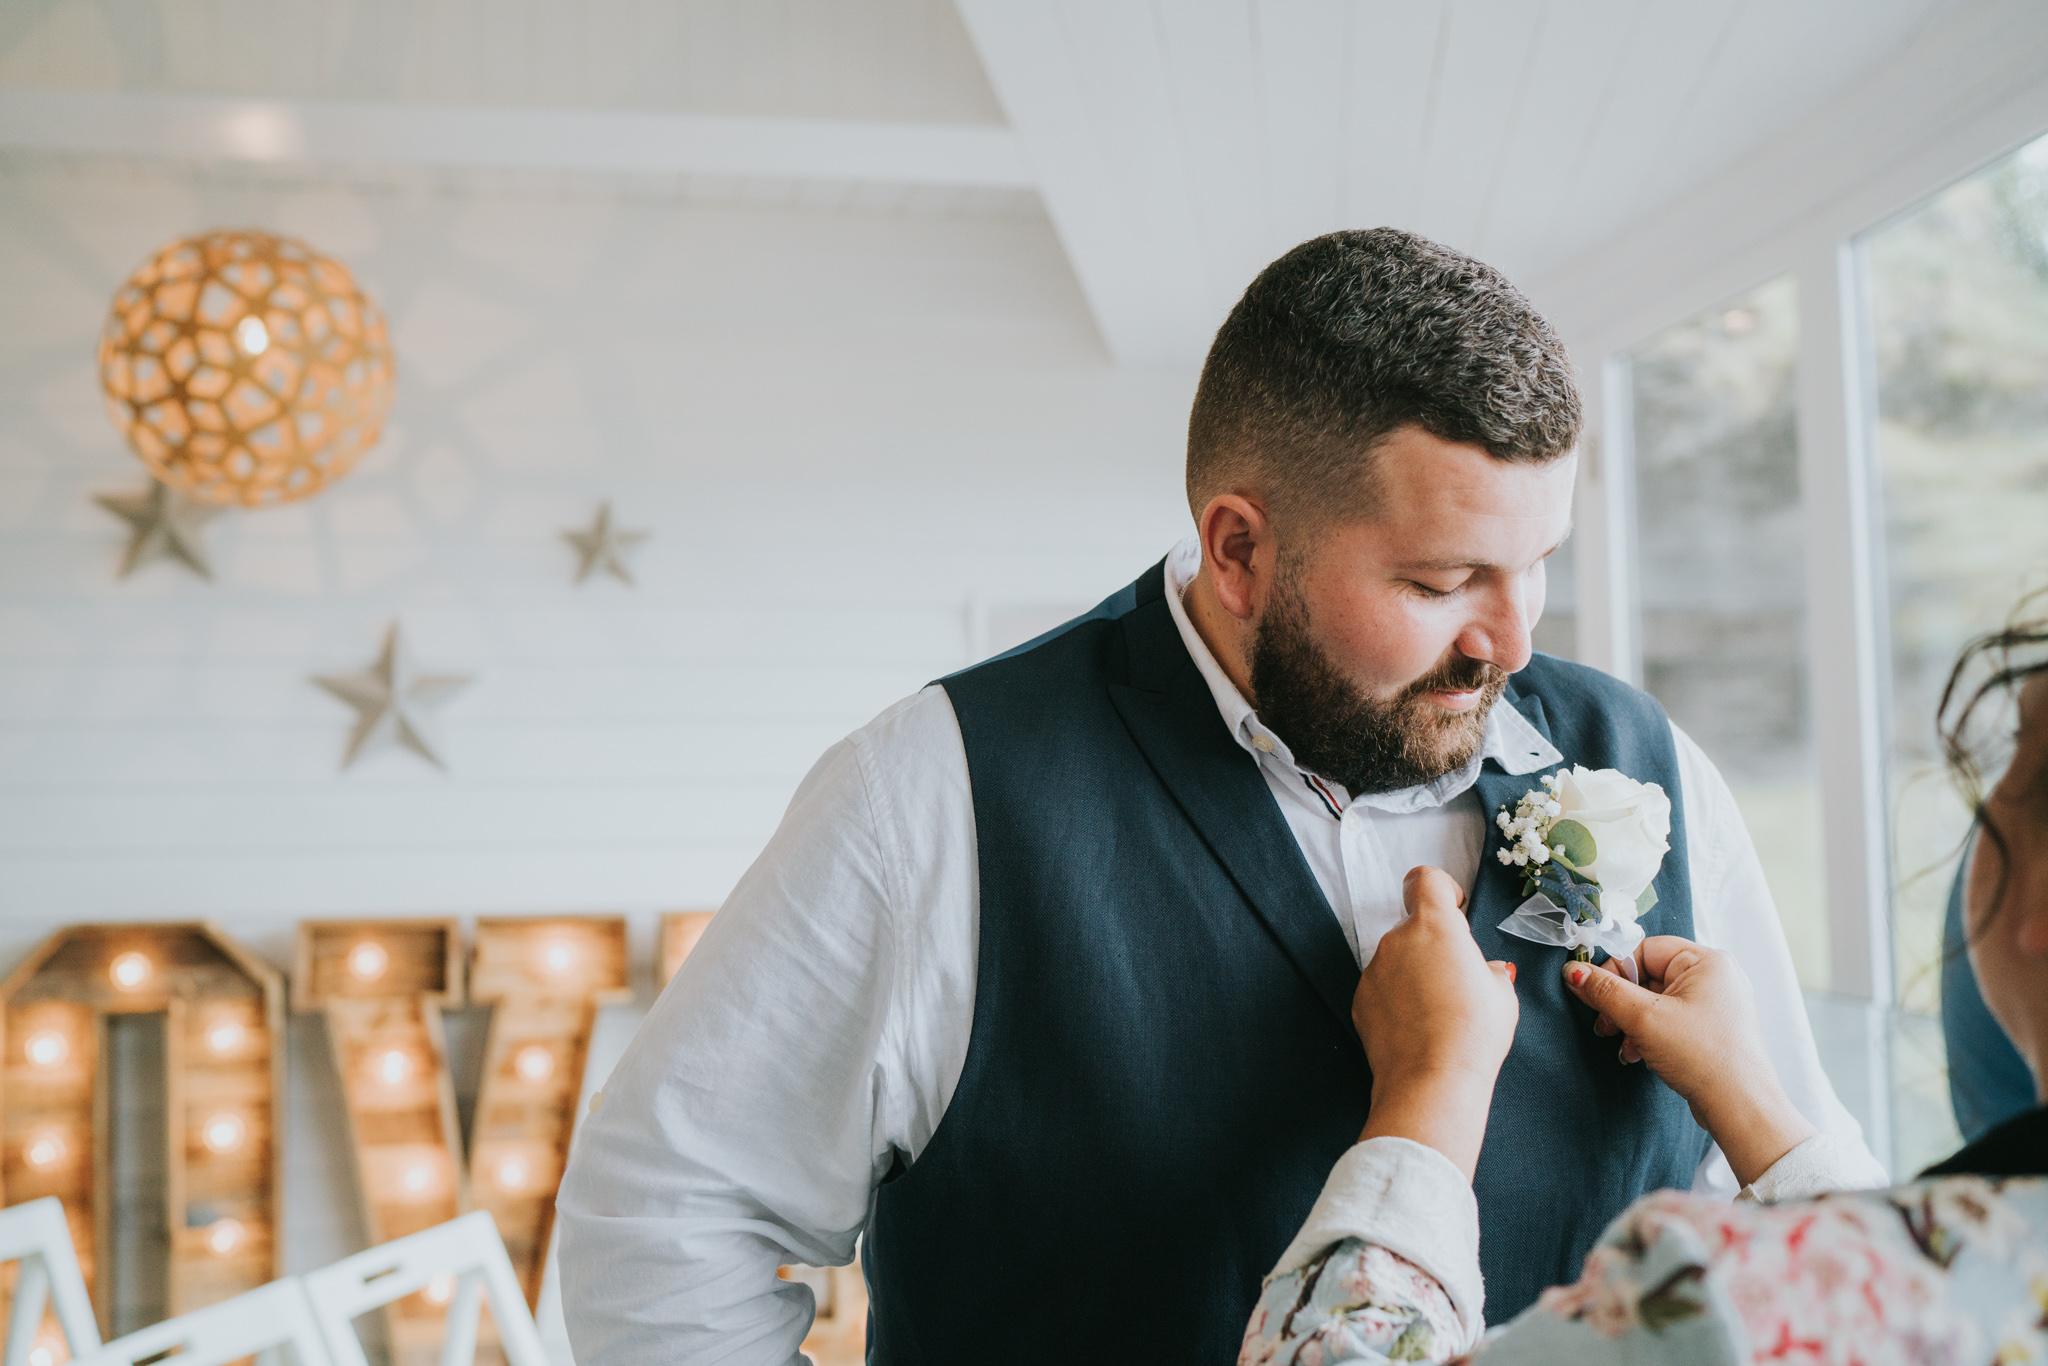 john-amy-relaxed-beach-wedding-tunnels-beaches-ilfracombe-north-devon-grace-elizabeth-colchester-essex-alternative-relaxed-wedding-photography-devon-suffolk-norfolk-essex (19 of 159).jpg